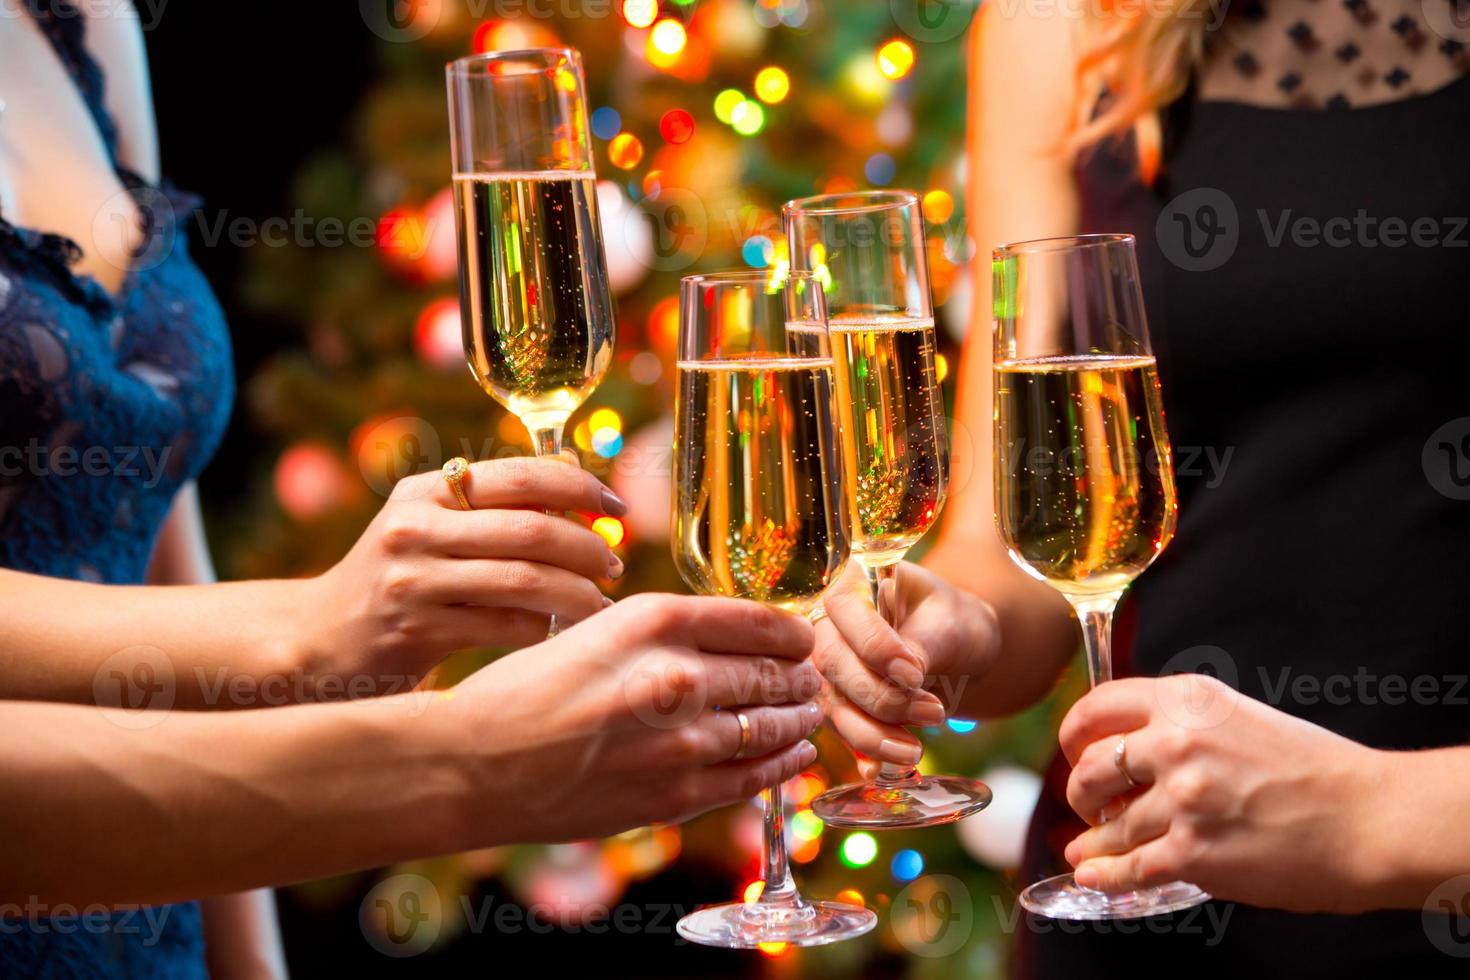 Frauenhände mit Kristallgläsern Champagner foto